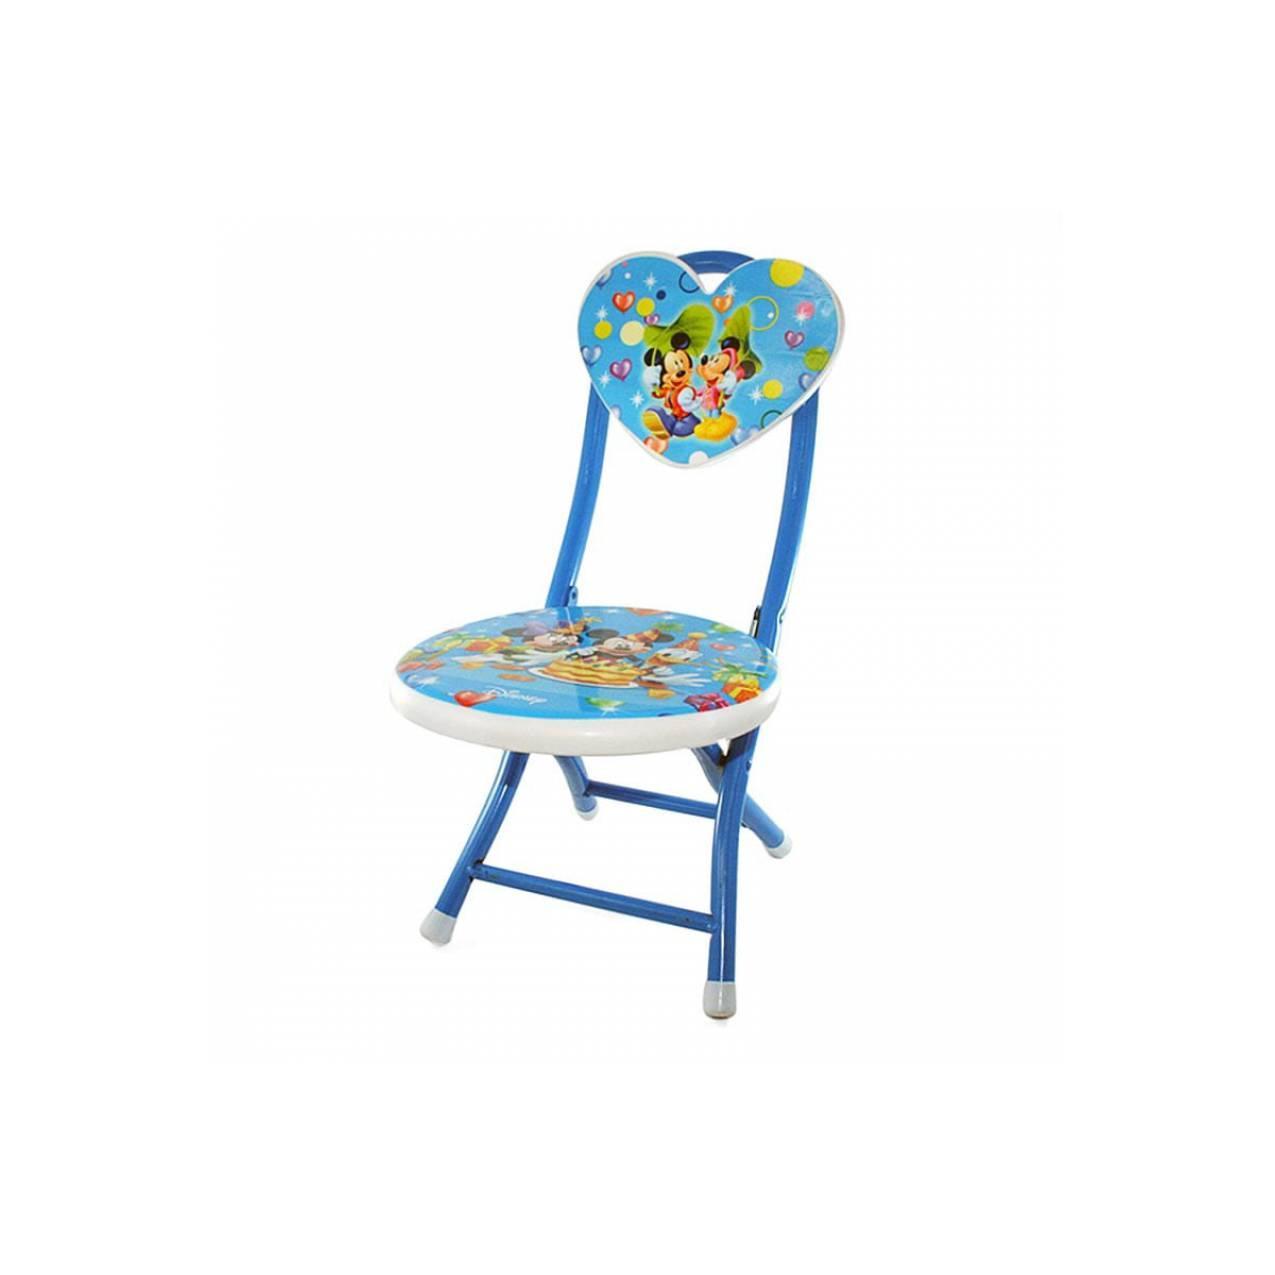 Fold Away Kursi Lipat Multifungsi Coklat Daftar Harga Terlengkap Funika 22017 Sbe Serbaguna Set Of 2 Muda Pcs Review Spesifikasi Source Ohome Besi Zzms Stool Folding Chair Mickey Mouse